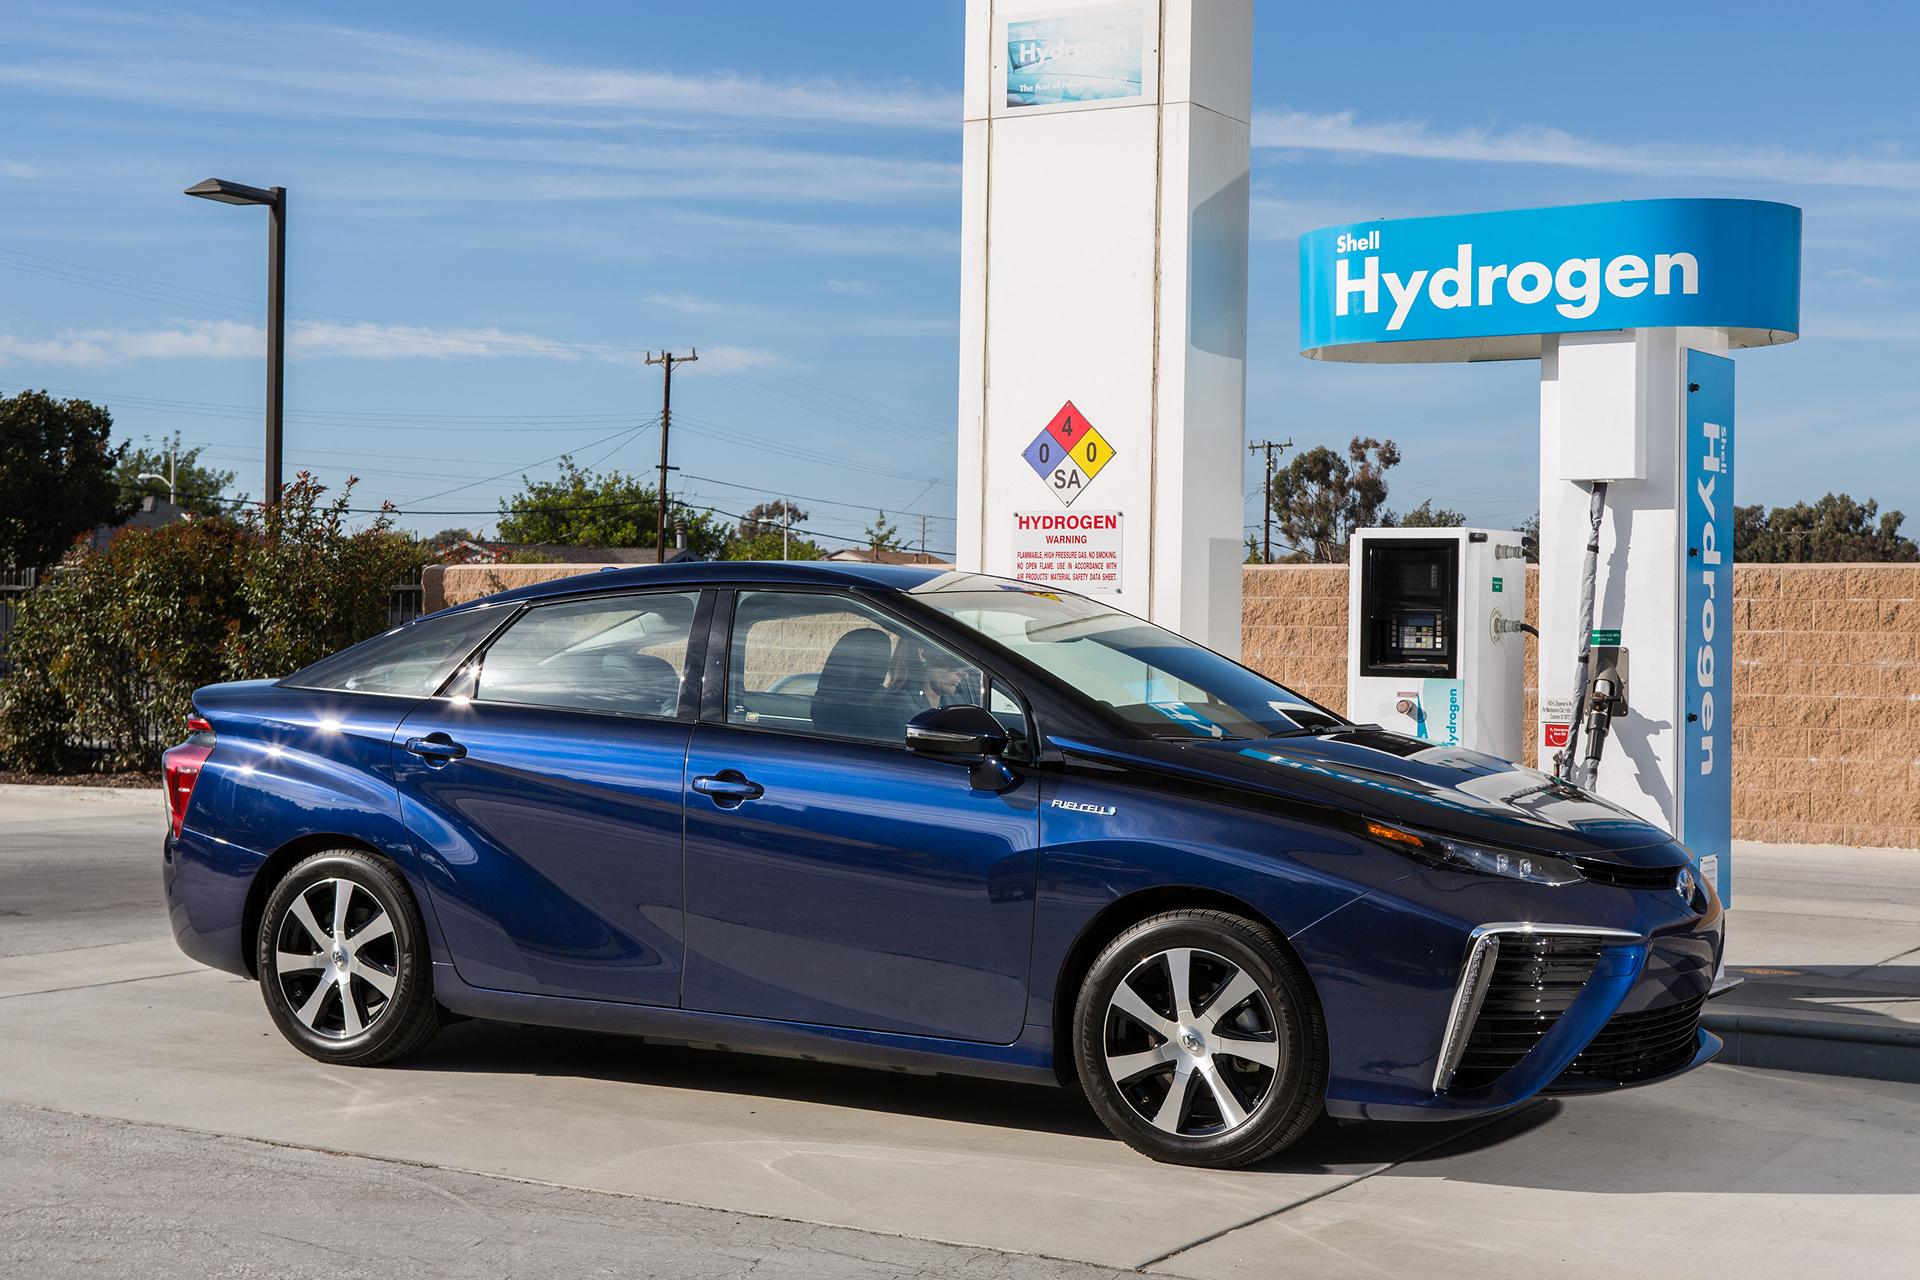 2017 Toyota Mirai Fuel Cell Sedan © Toyota Motor Corporation